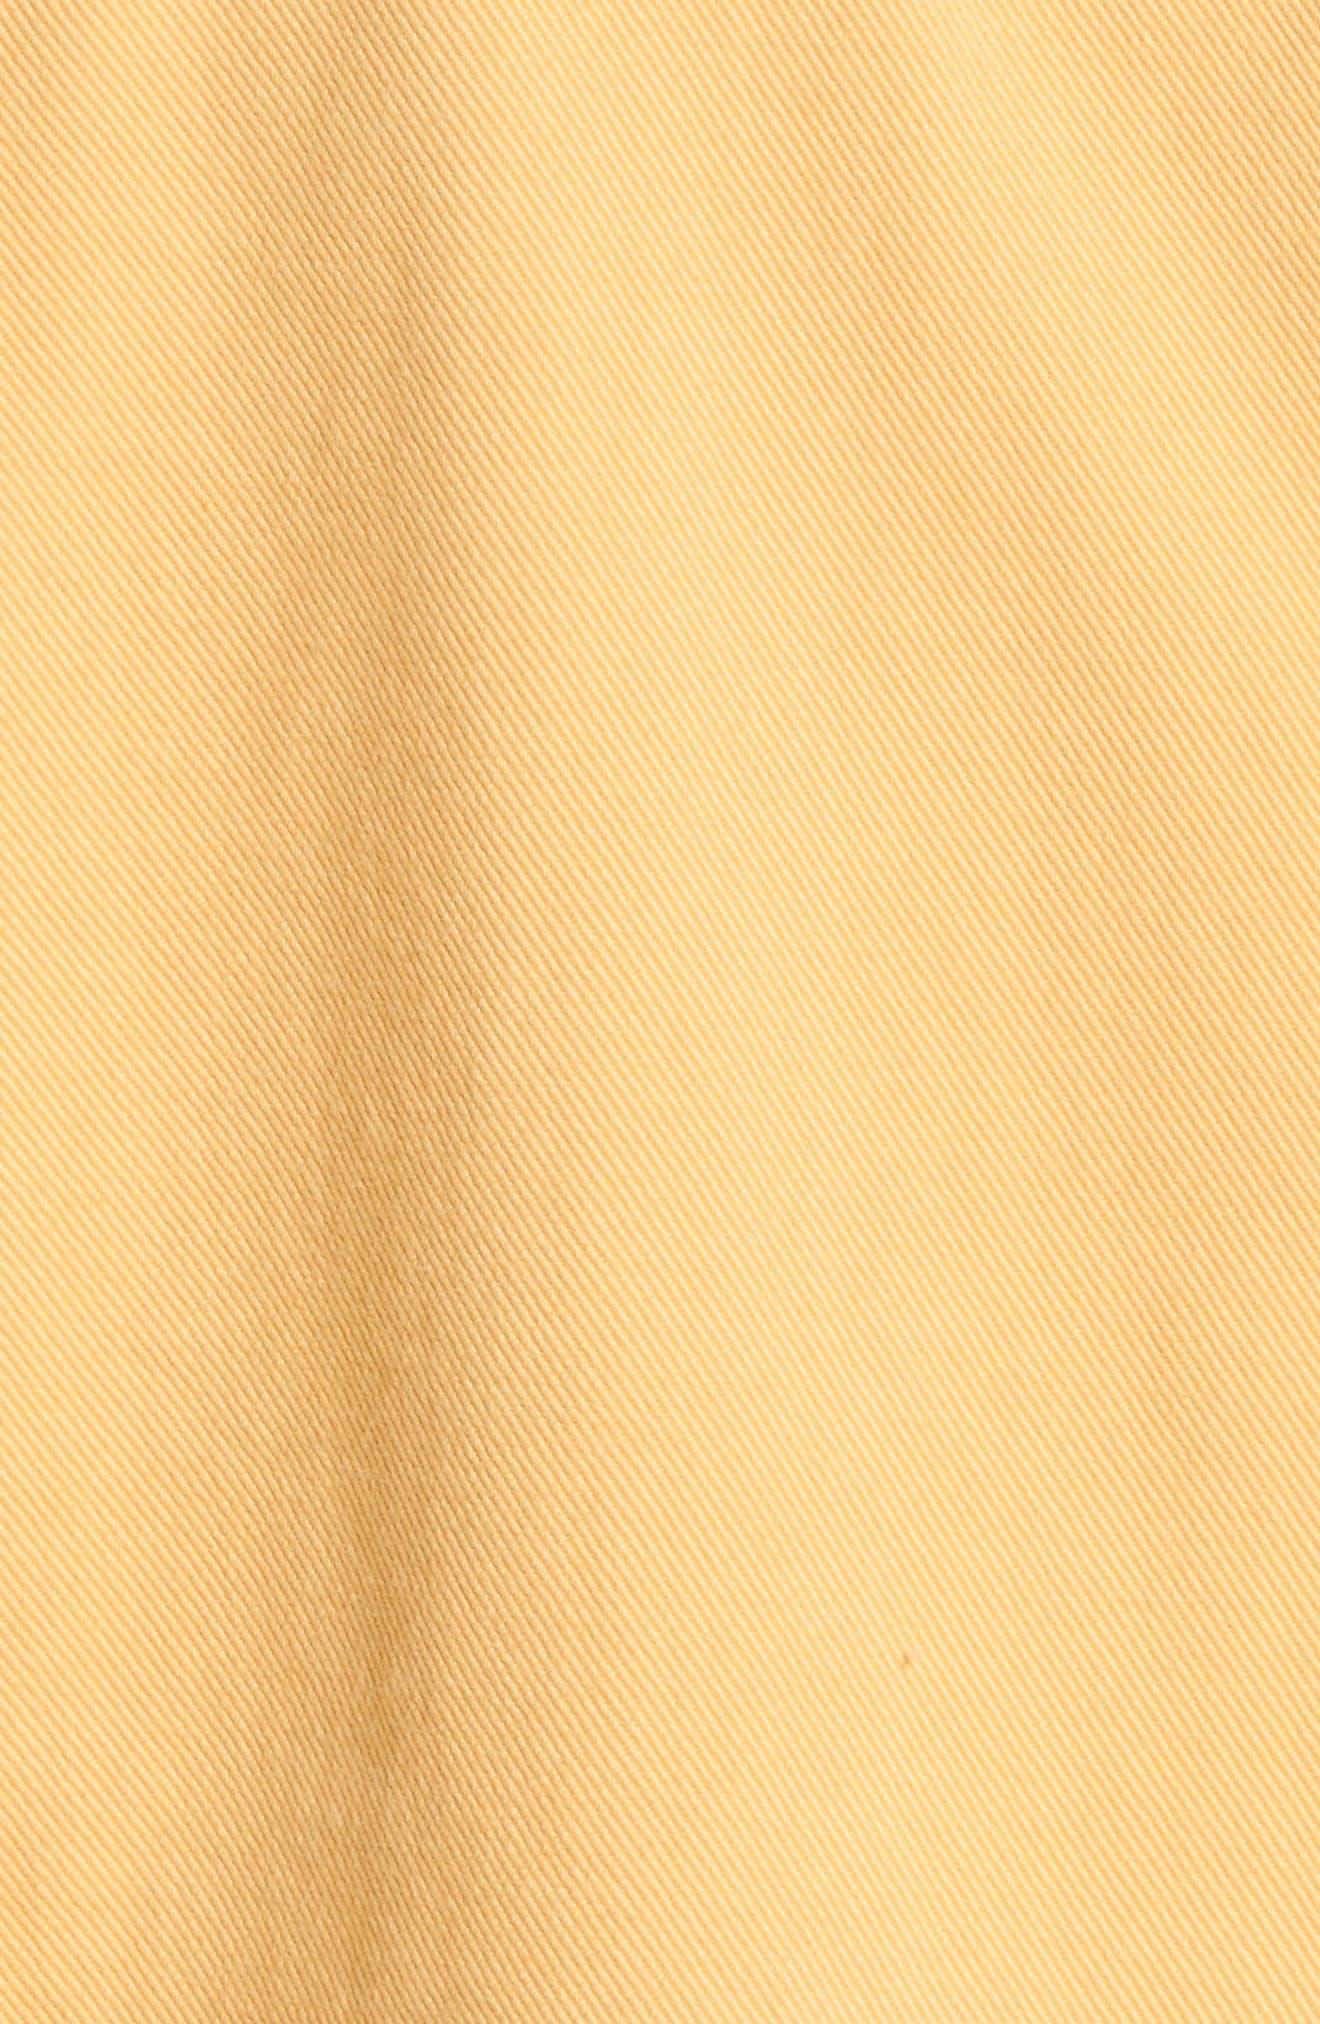 rag & bone Oversize Twill Jacket,                             Alternate thumbnail 6, color,                             730